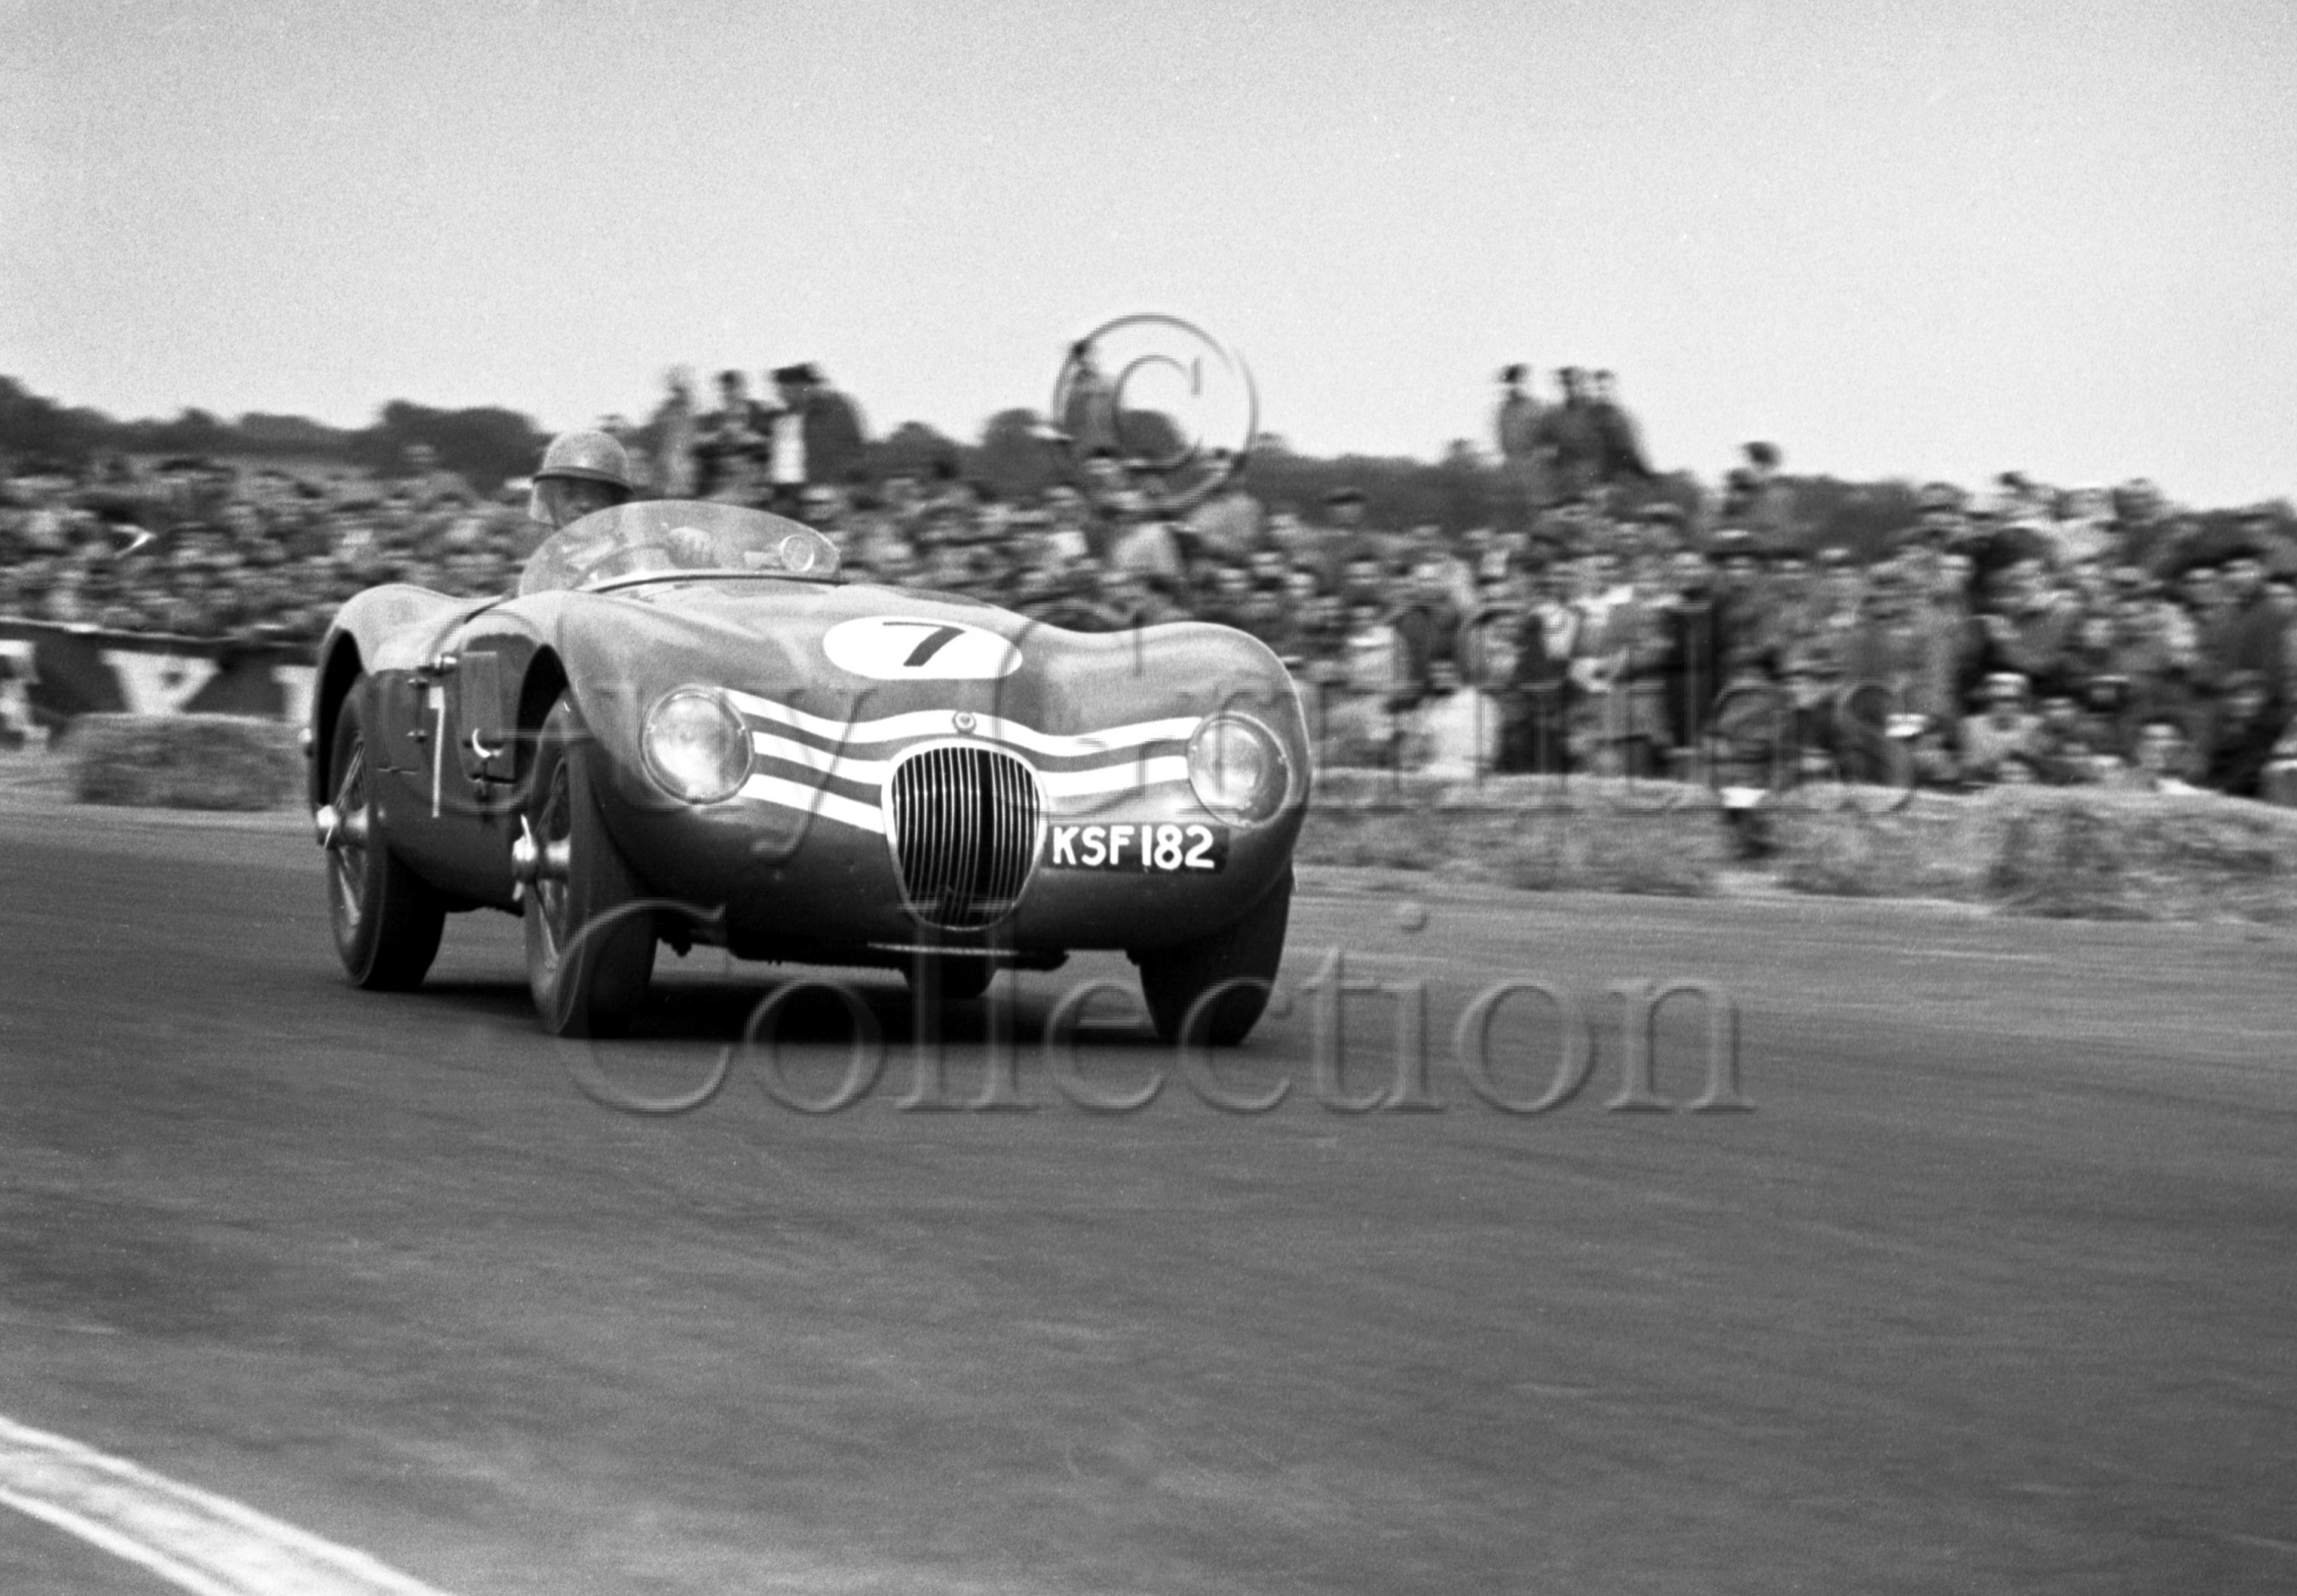 74-101–N-Sanderson–Jaguar-C-Type-KSF182—Silverstone–18-07-1953.jpg - Guy Griffiths Collection